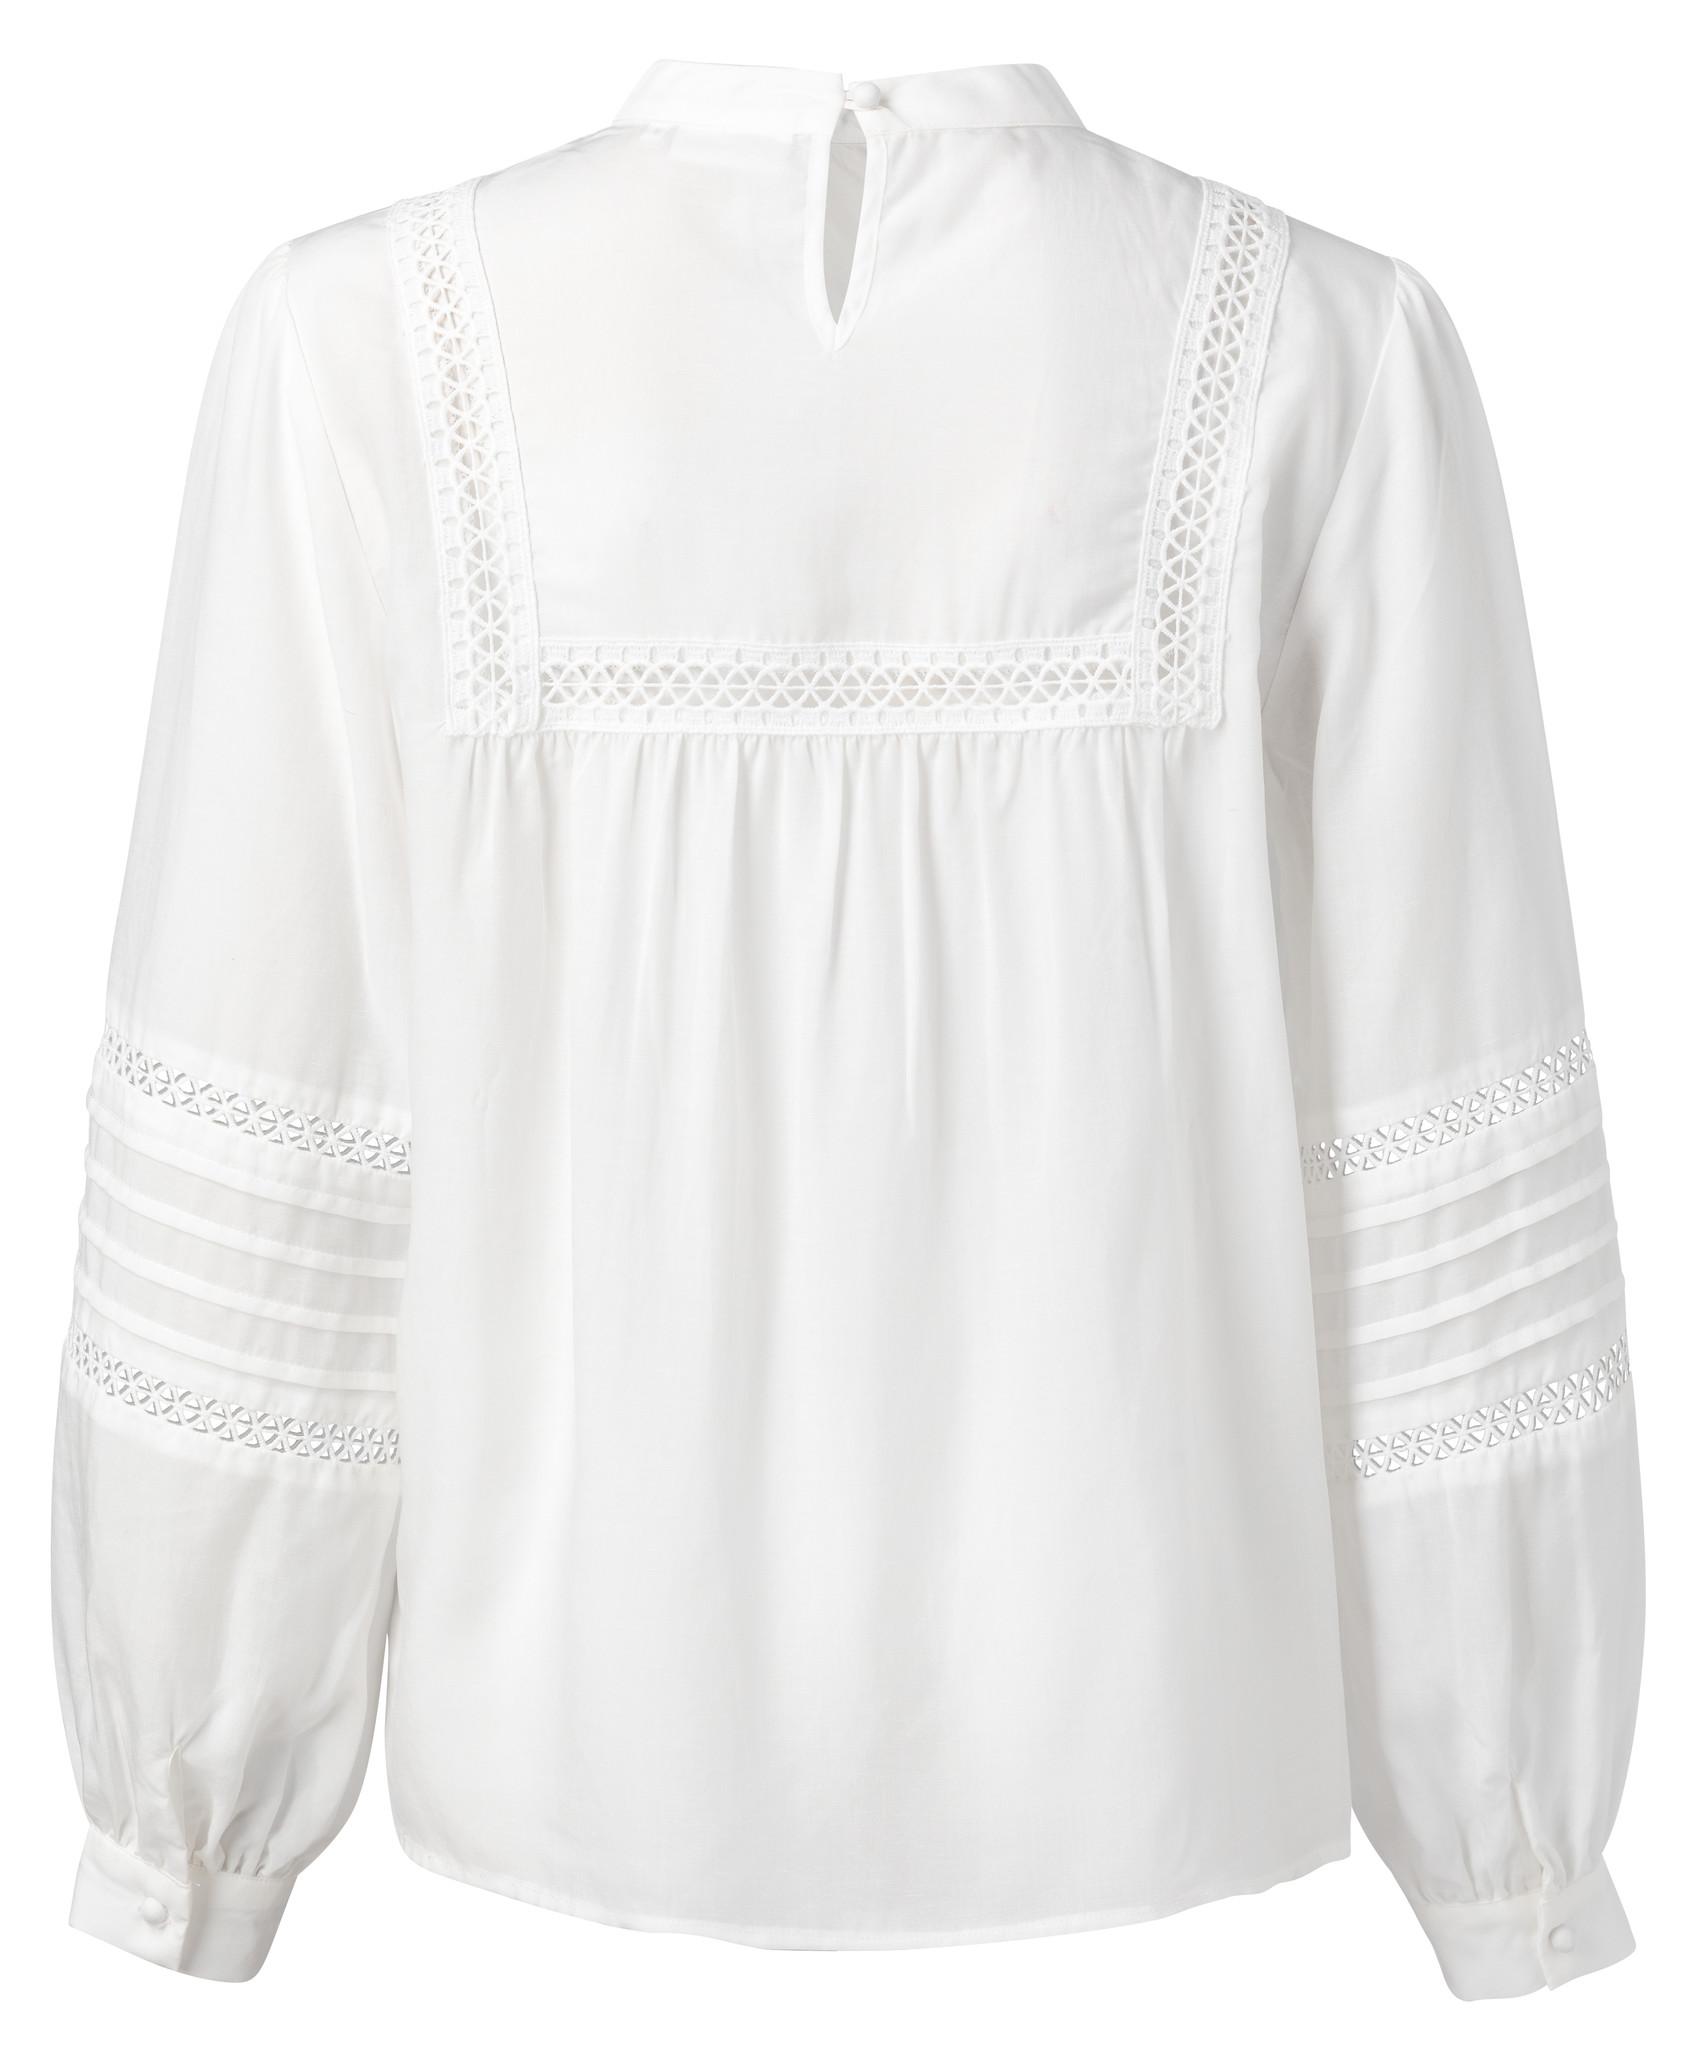 yaya Shirt with embroider 1101160-014-3